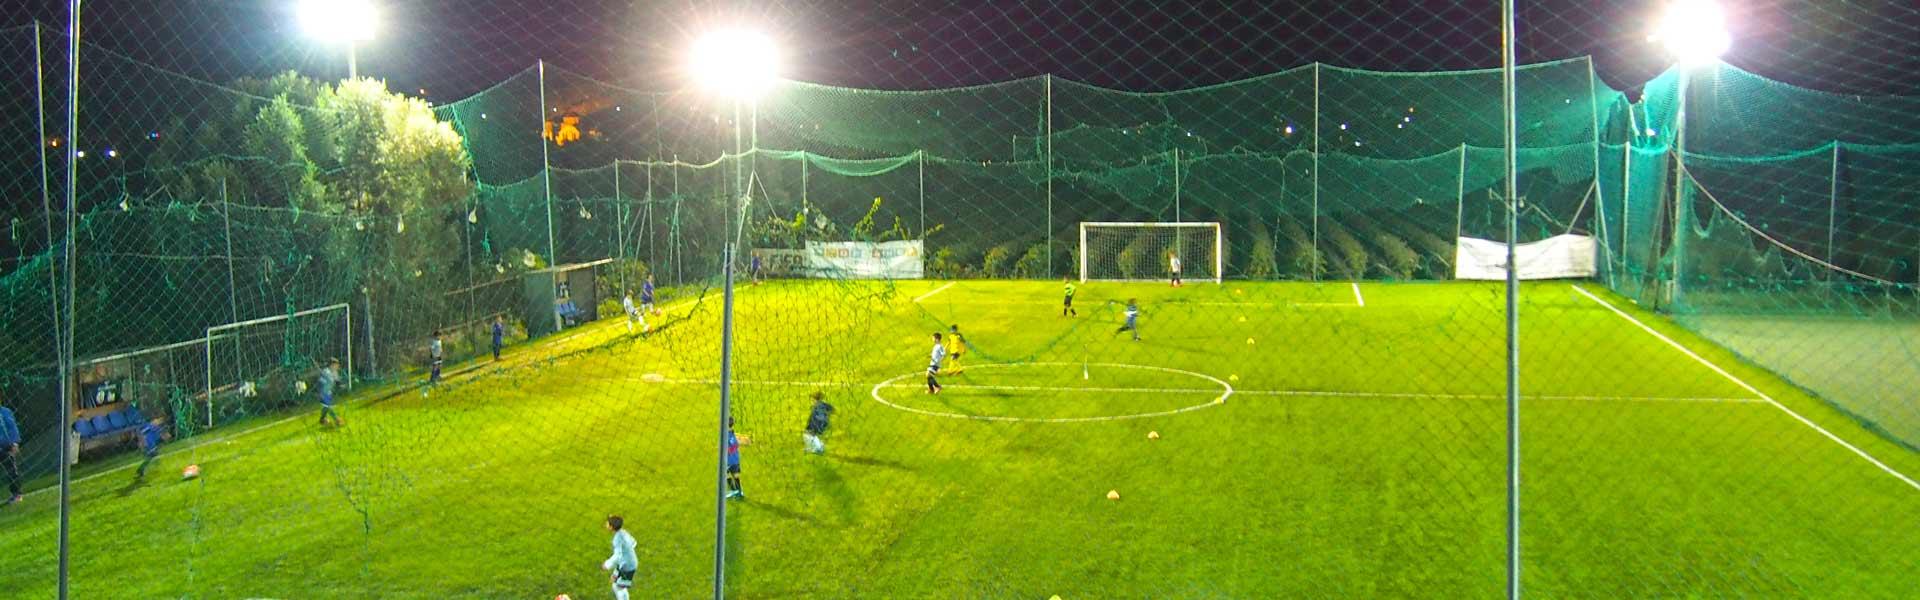 El Clasico γήπεδο 7x7 Χαλκίδα